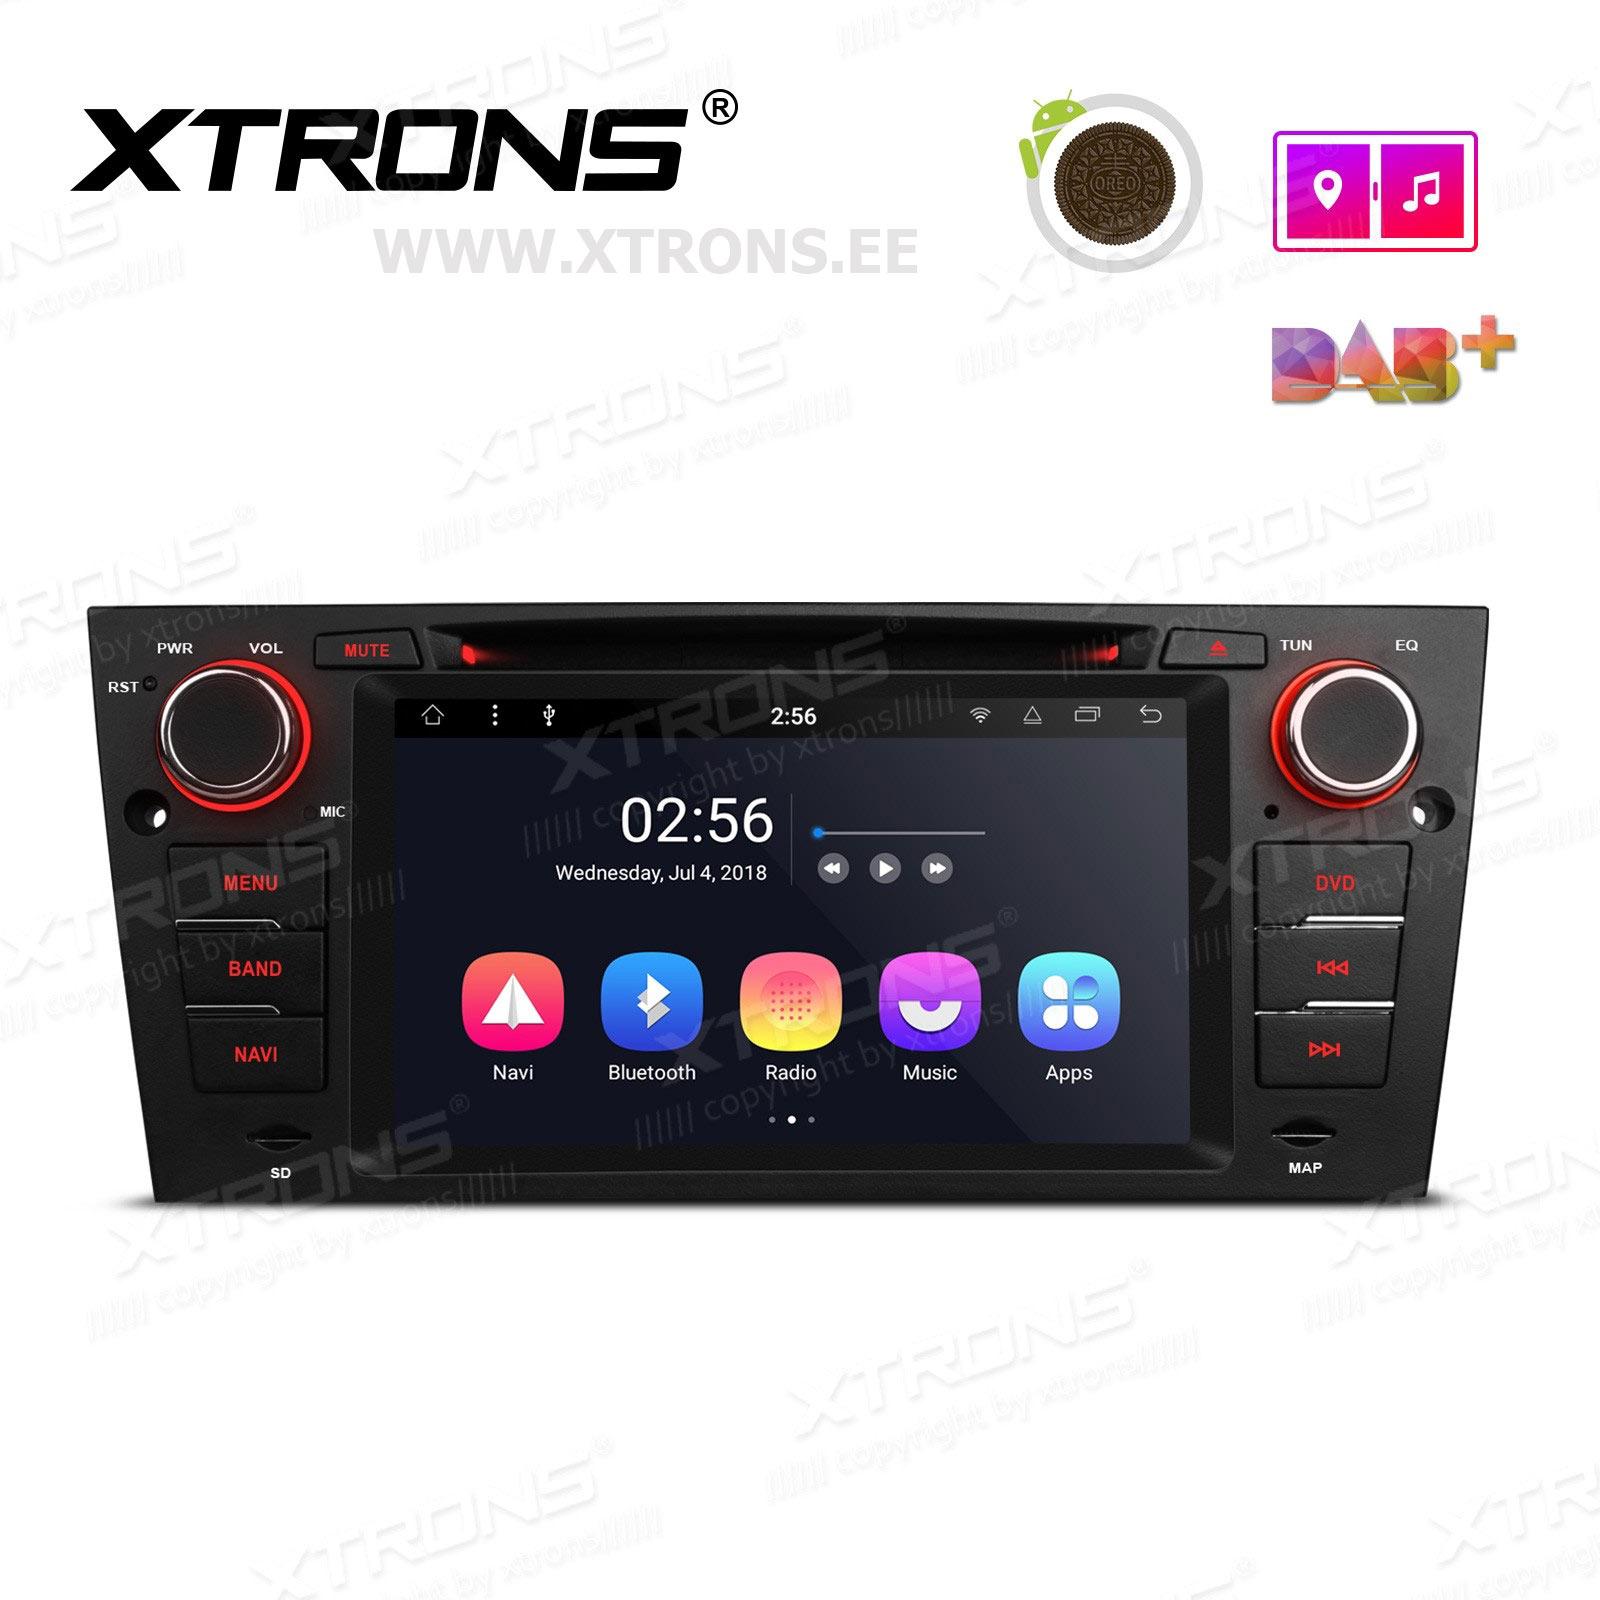 XTRONS PR7890B